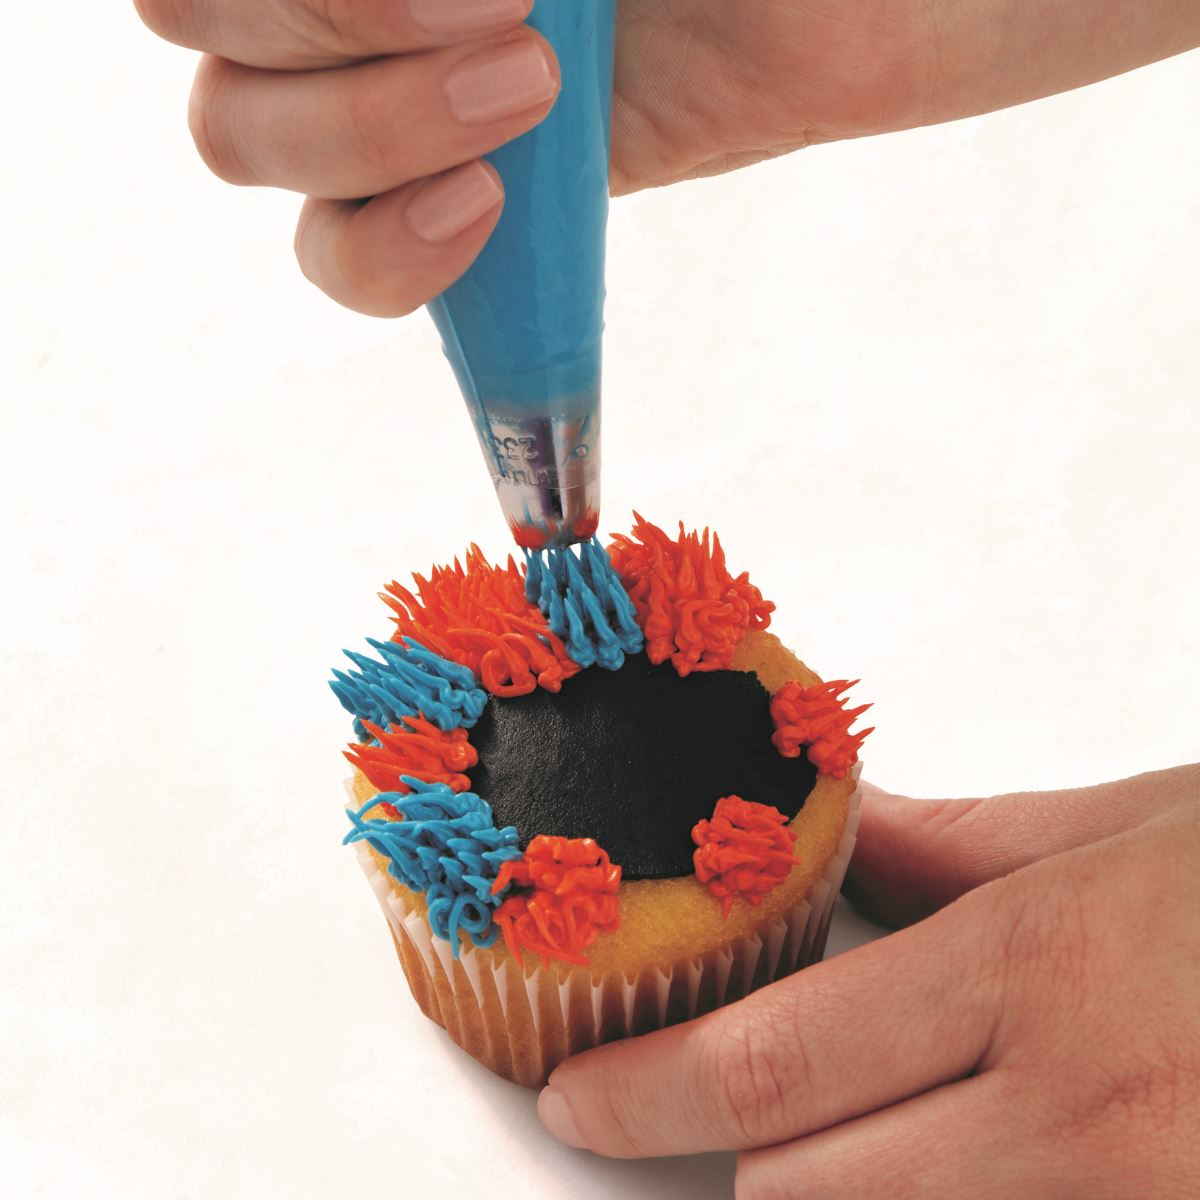 BLUE AND ORANGE MONSTER CUPCAKE step 5